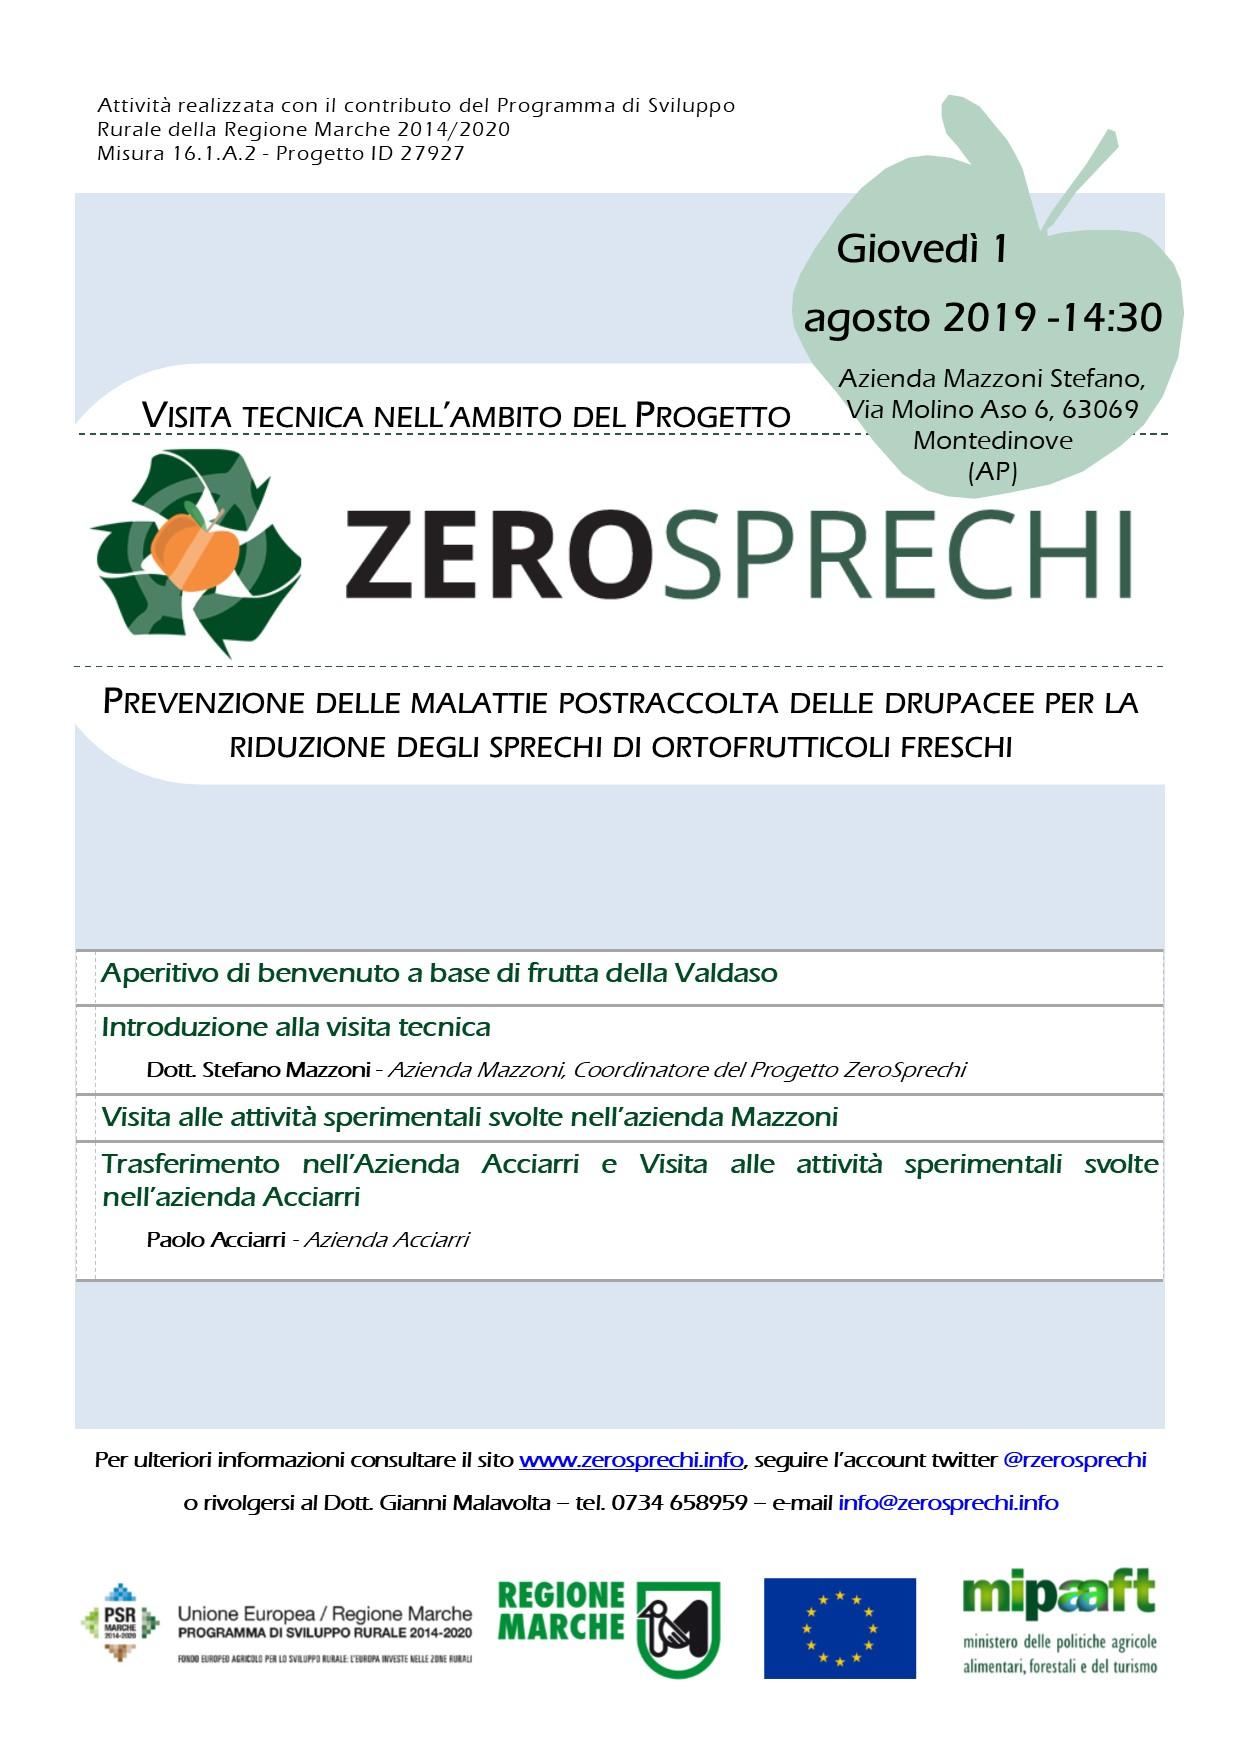 Technical visit Thursday 1st August,2019